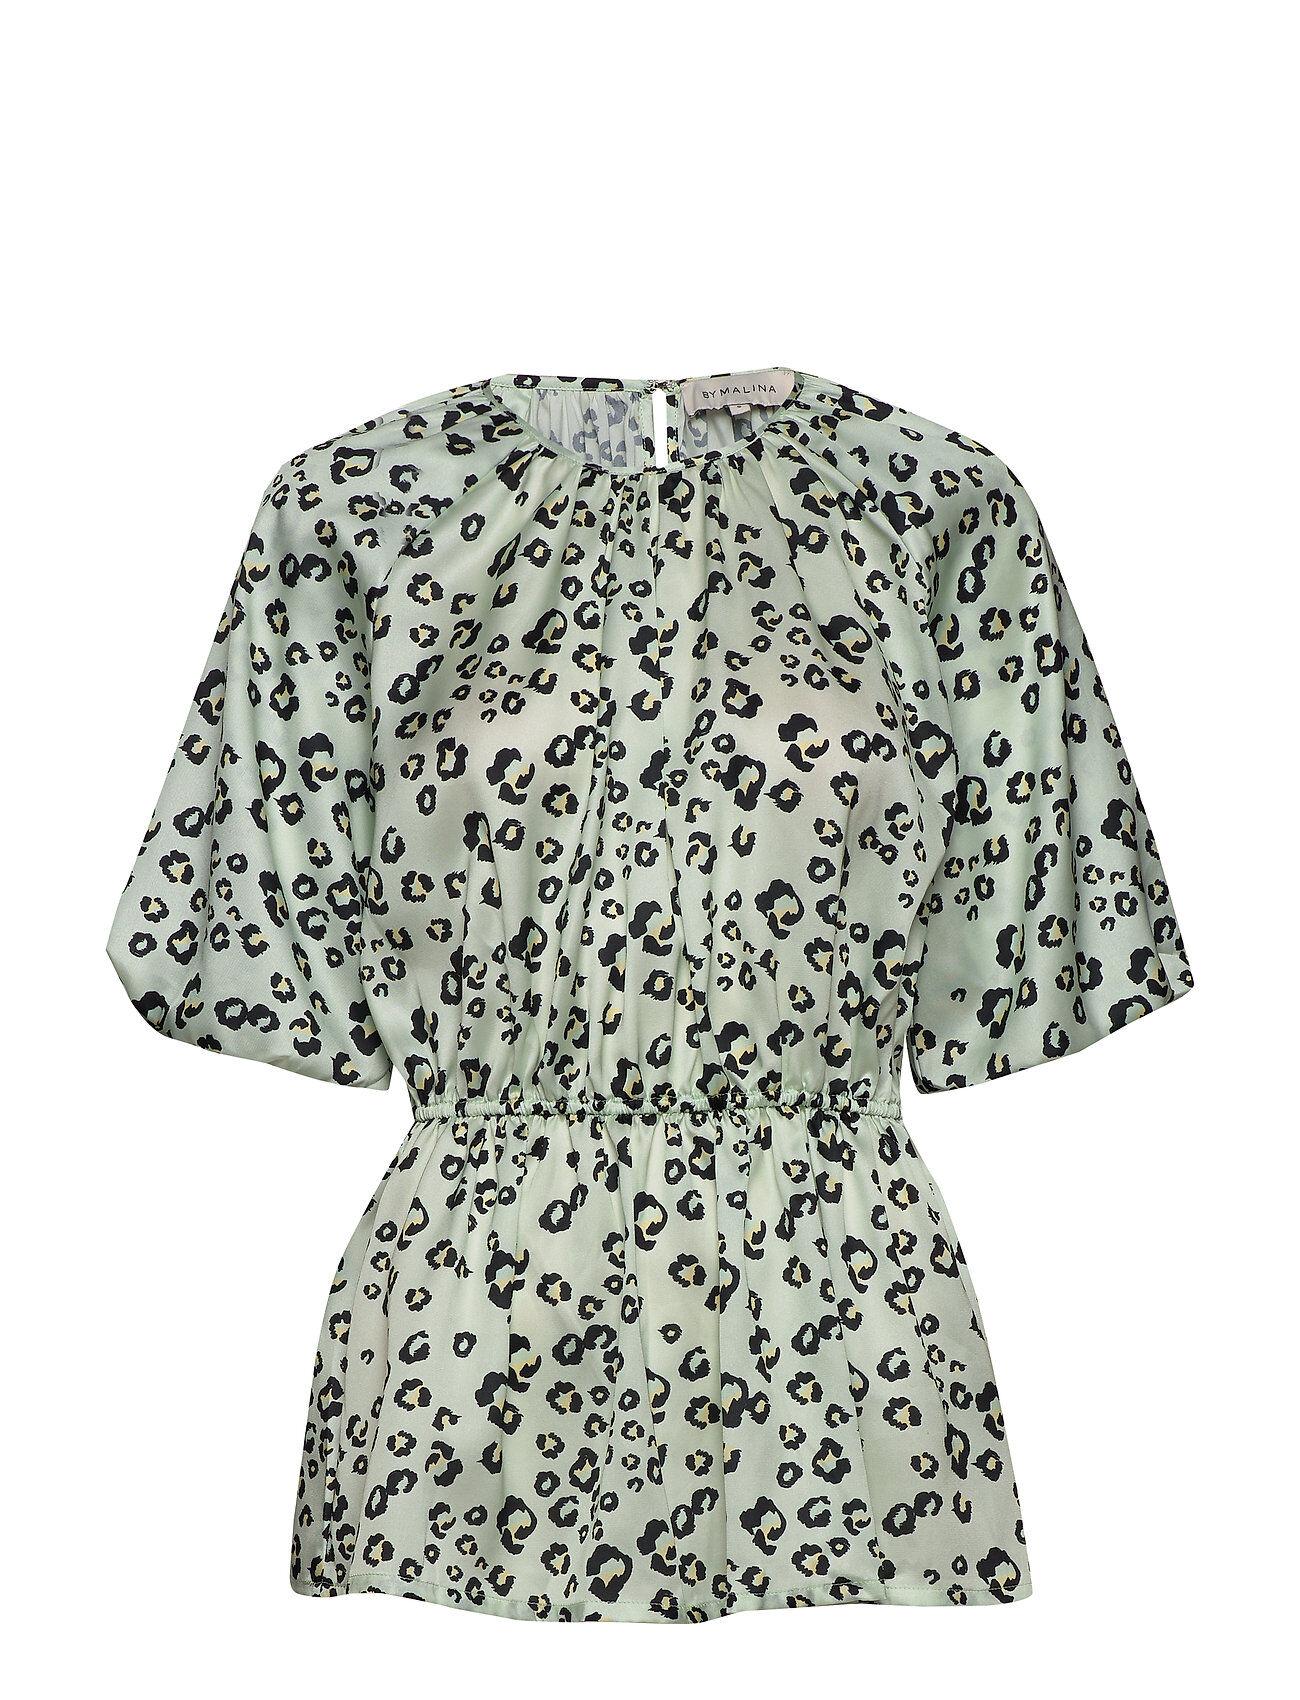 By Malina Mina Blouse Blouses Short-sleeved Vihreä By Malina